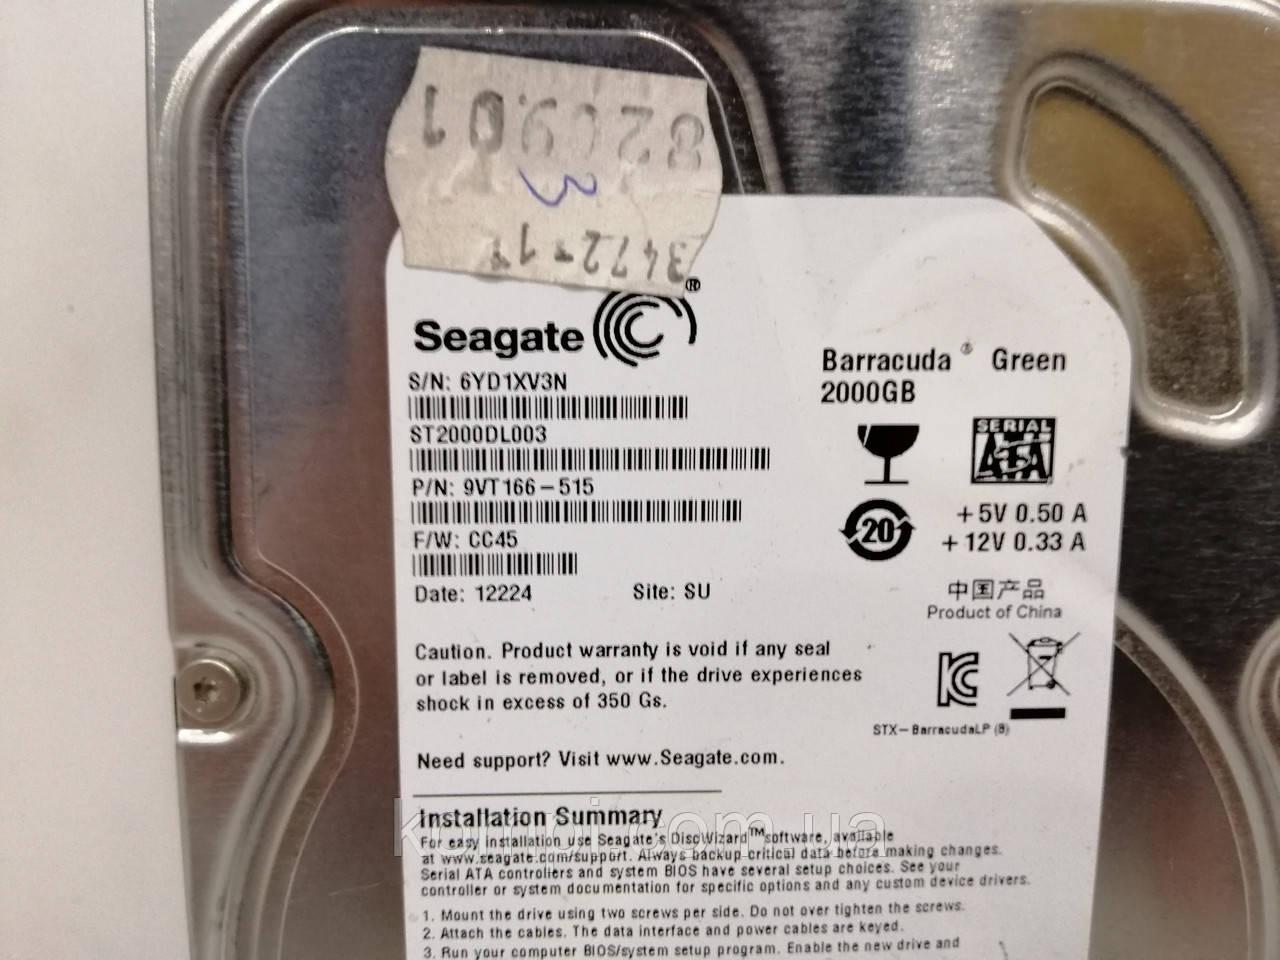 "HDD Жорсткий диск Seagate Barracuda Green 2TB 5900rpm 64MB 3.5"" SATA III  для ПК ІДЕАЛЬНИЙ СТАН"